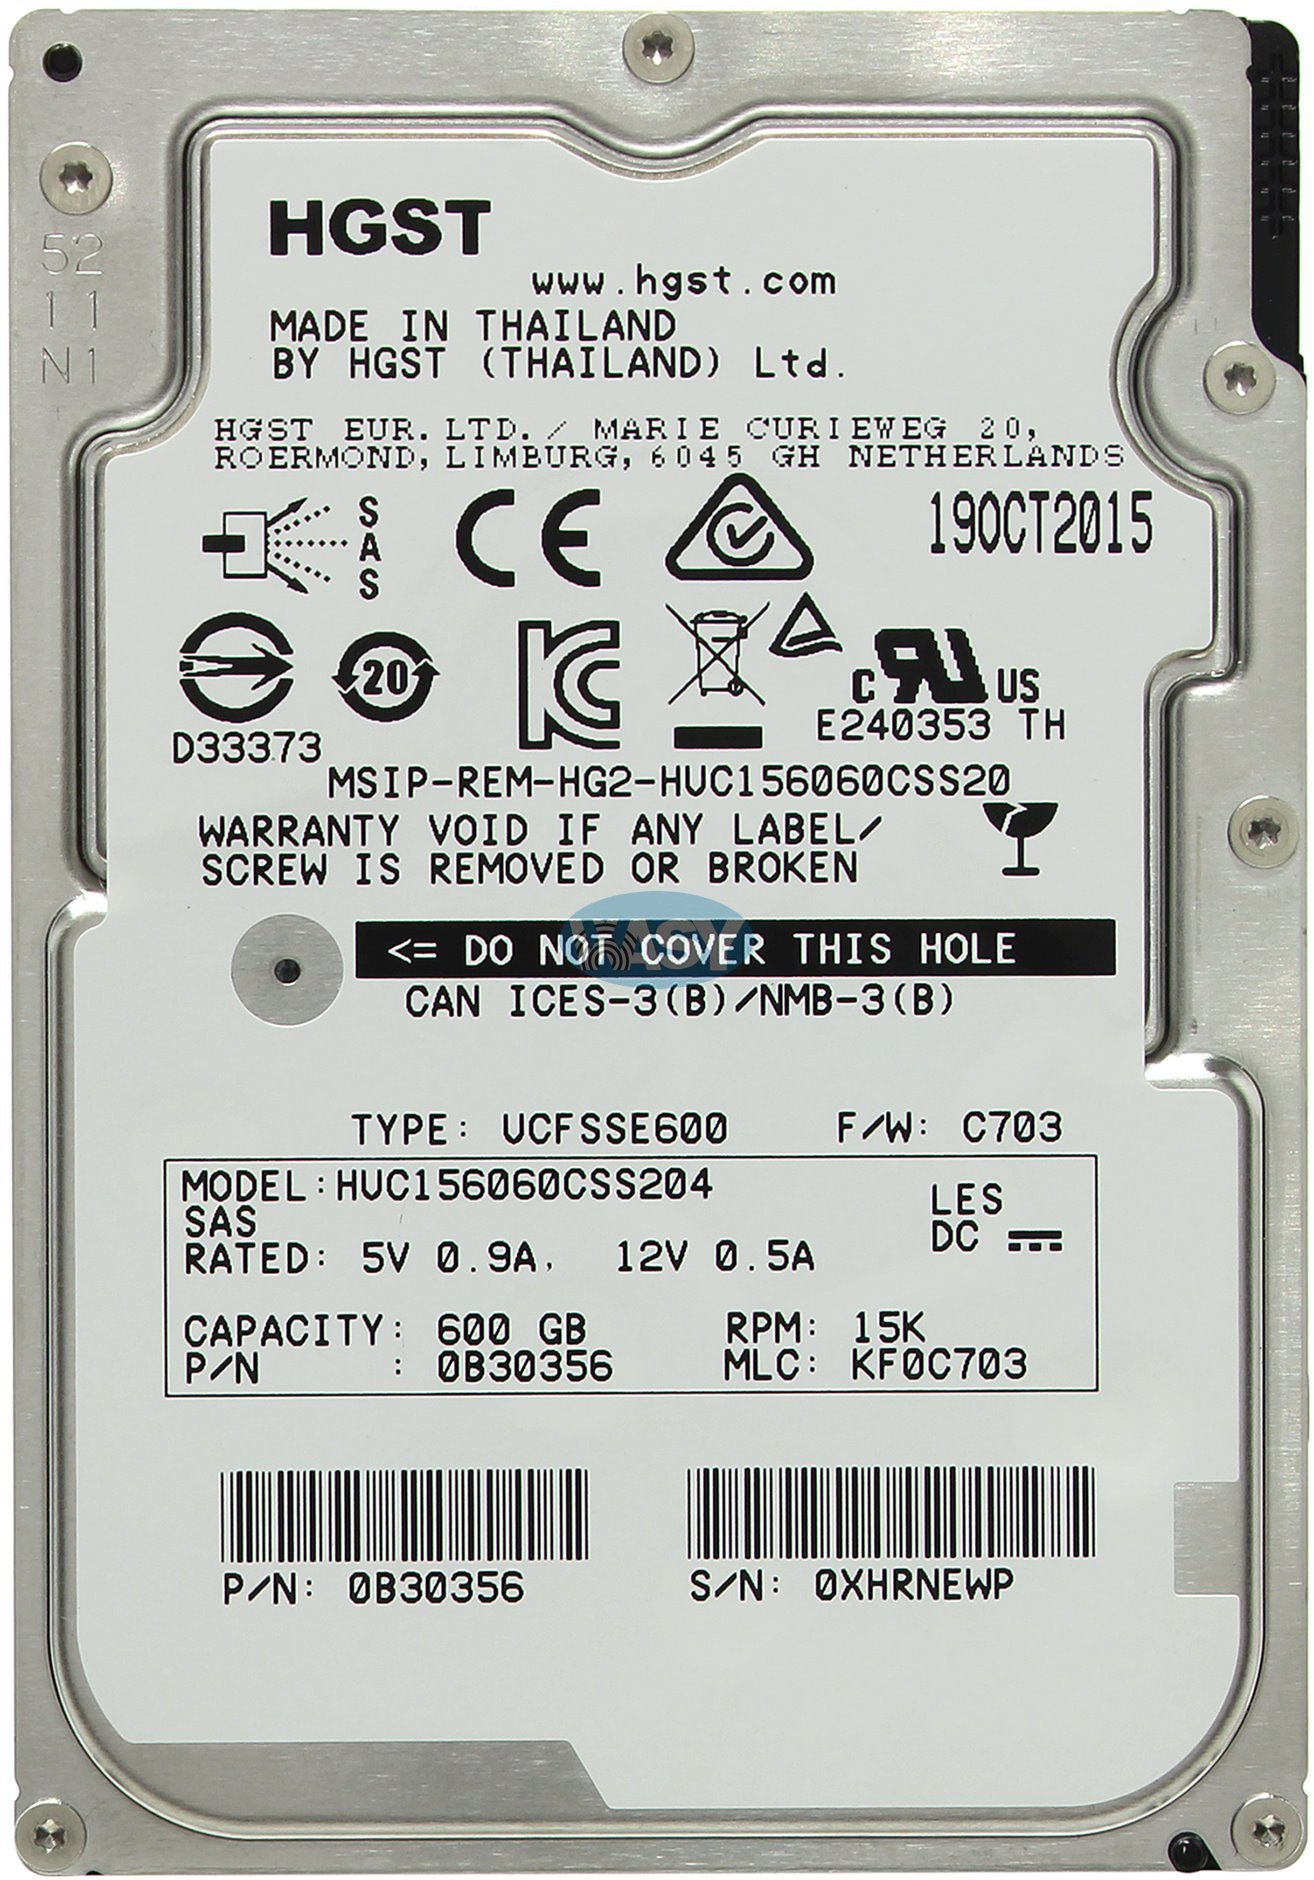 "HGST HUC156060CSS204 600GB SAS 2.5/"" Hard Drive 12GB//S 15K RPM 128MB 0B30356"